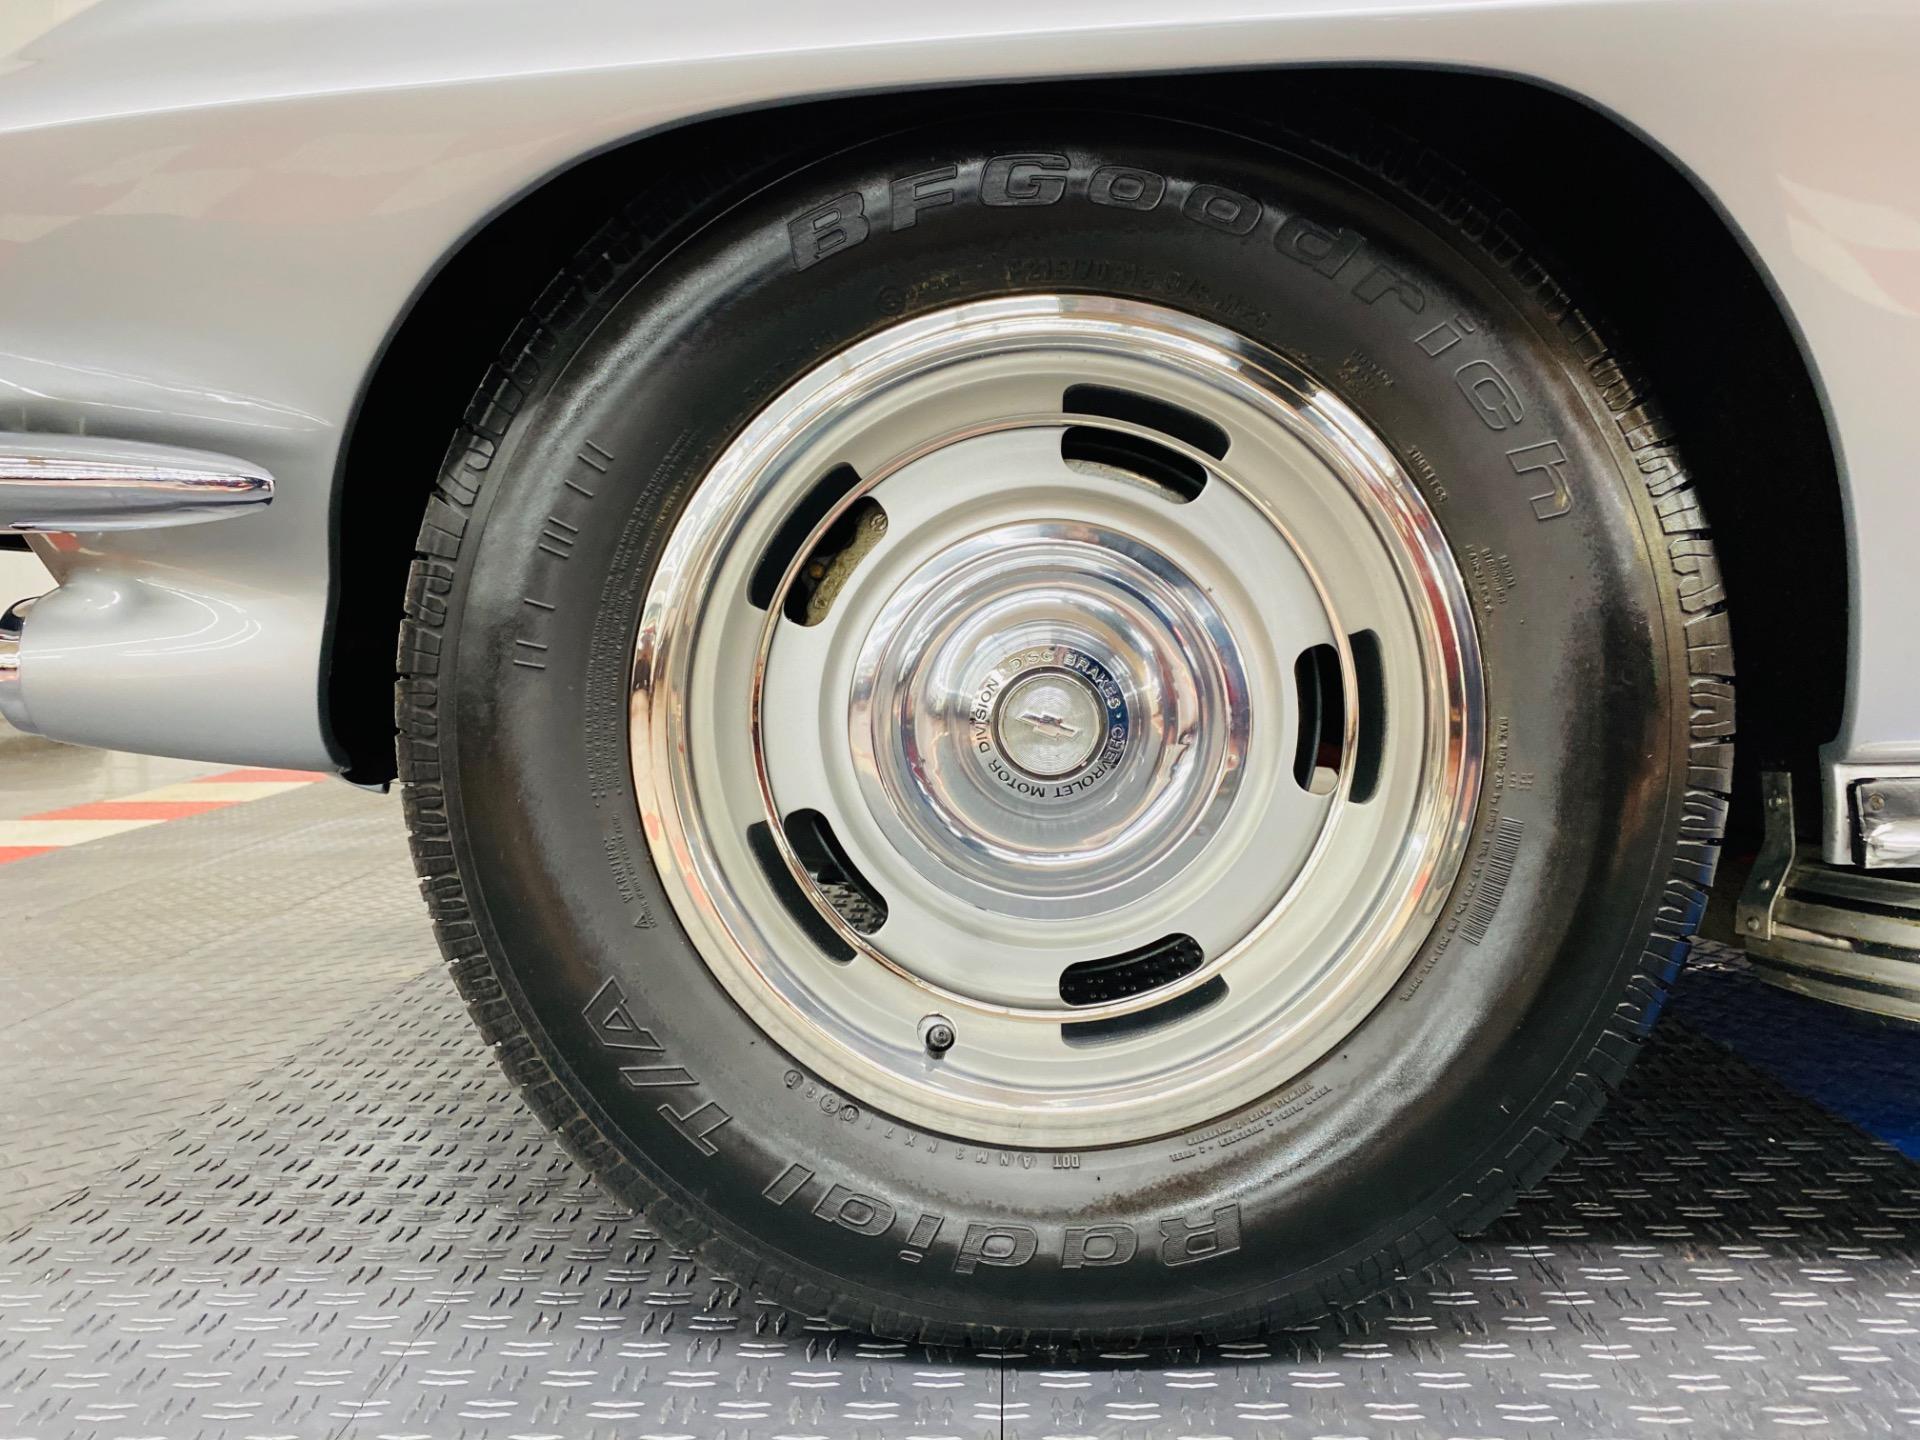 Used 1967 Chevrolet Corvette - TWO TOP CONVERTIBLE - TRI POWER 427 - TANK STICKER - SEE VIDEO | Mundelein, IL